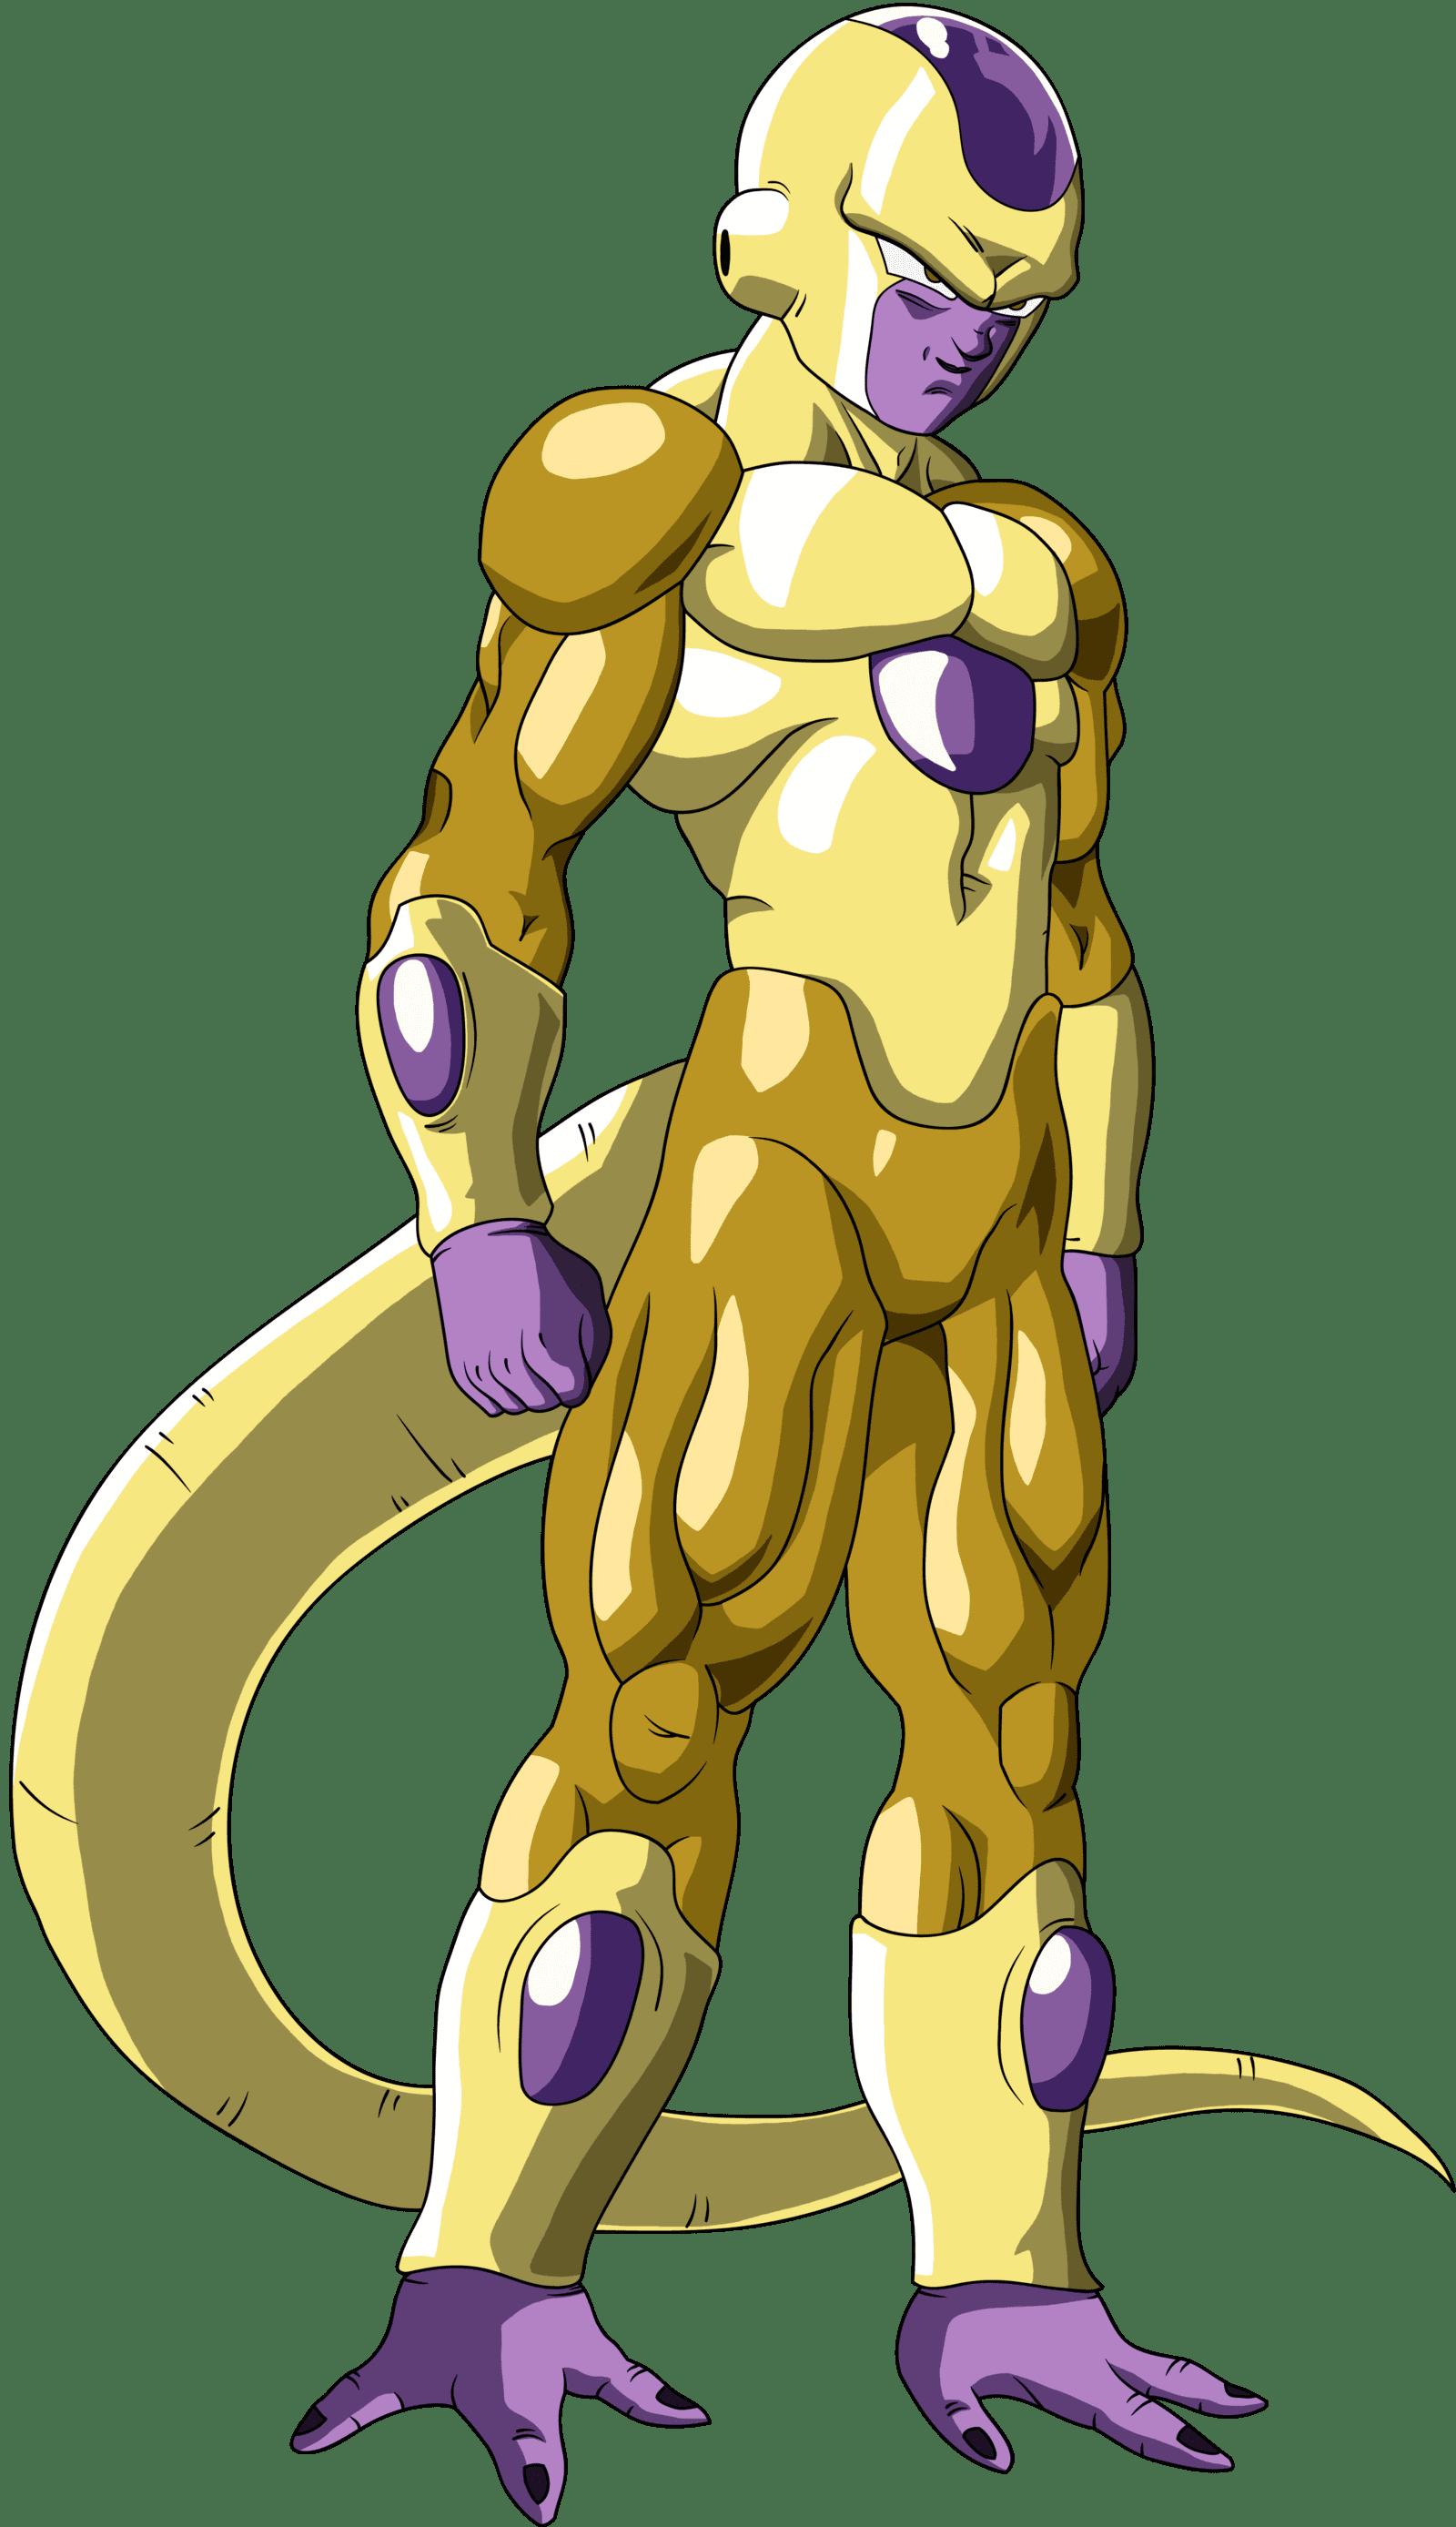 Golden Frieza Wiki